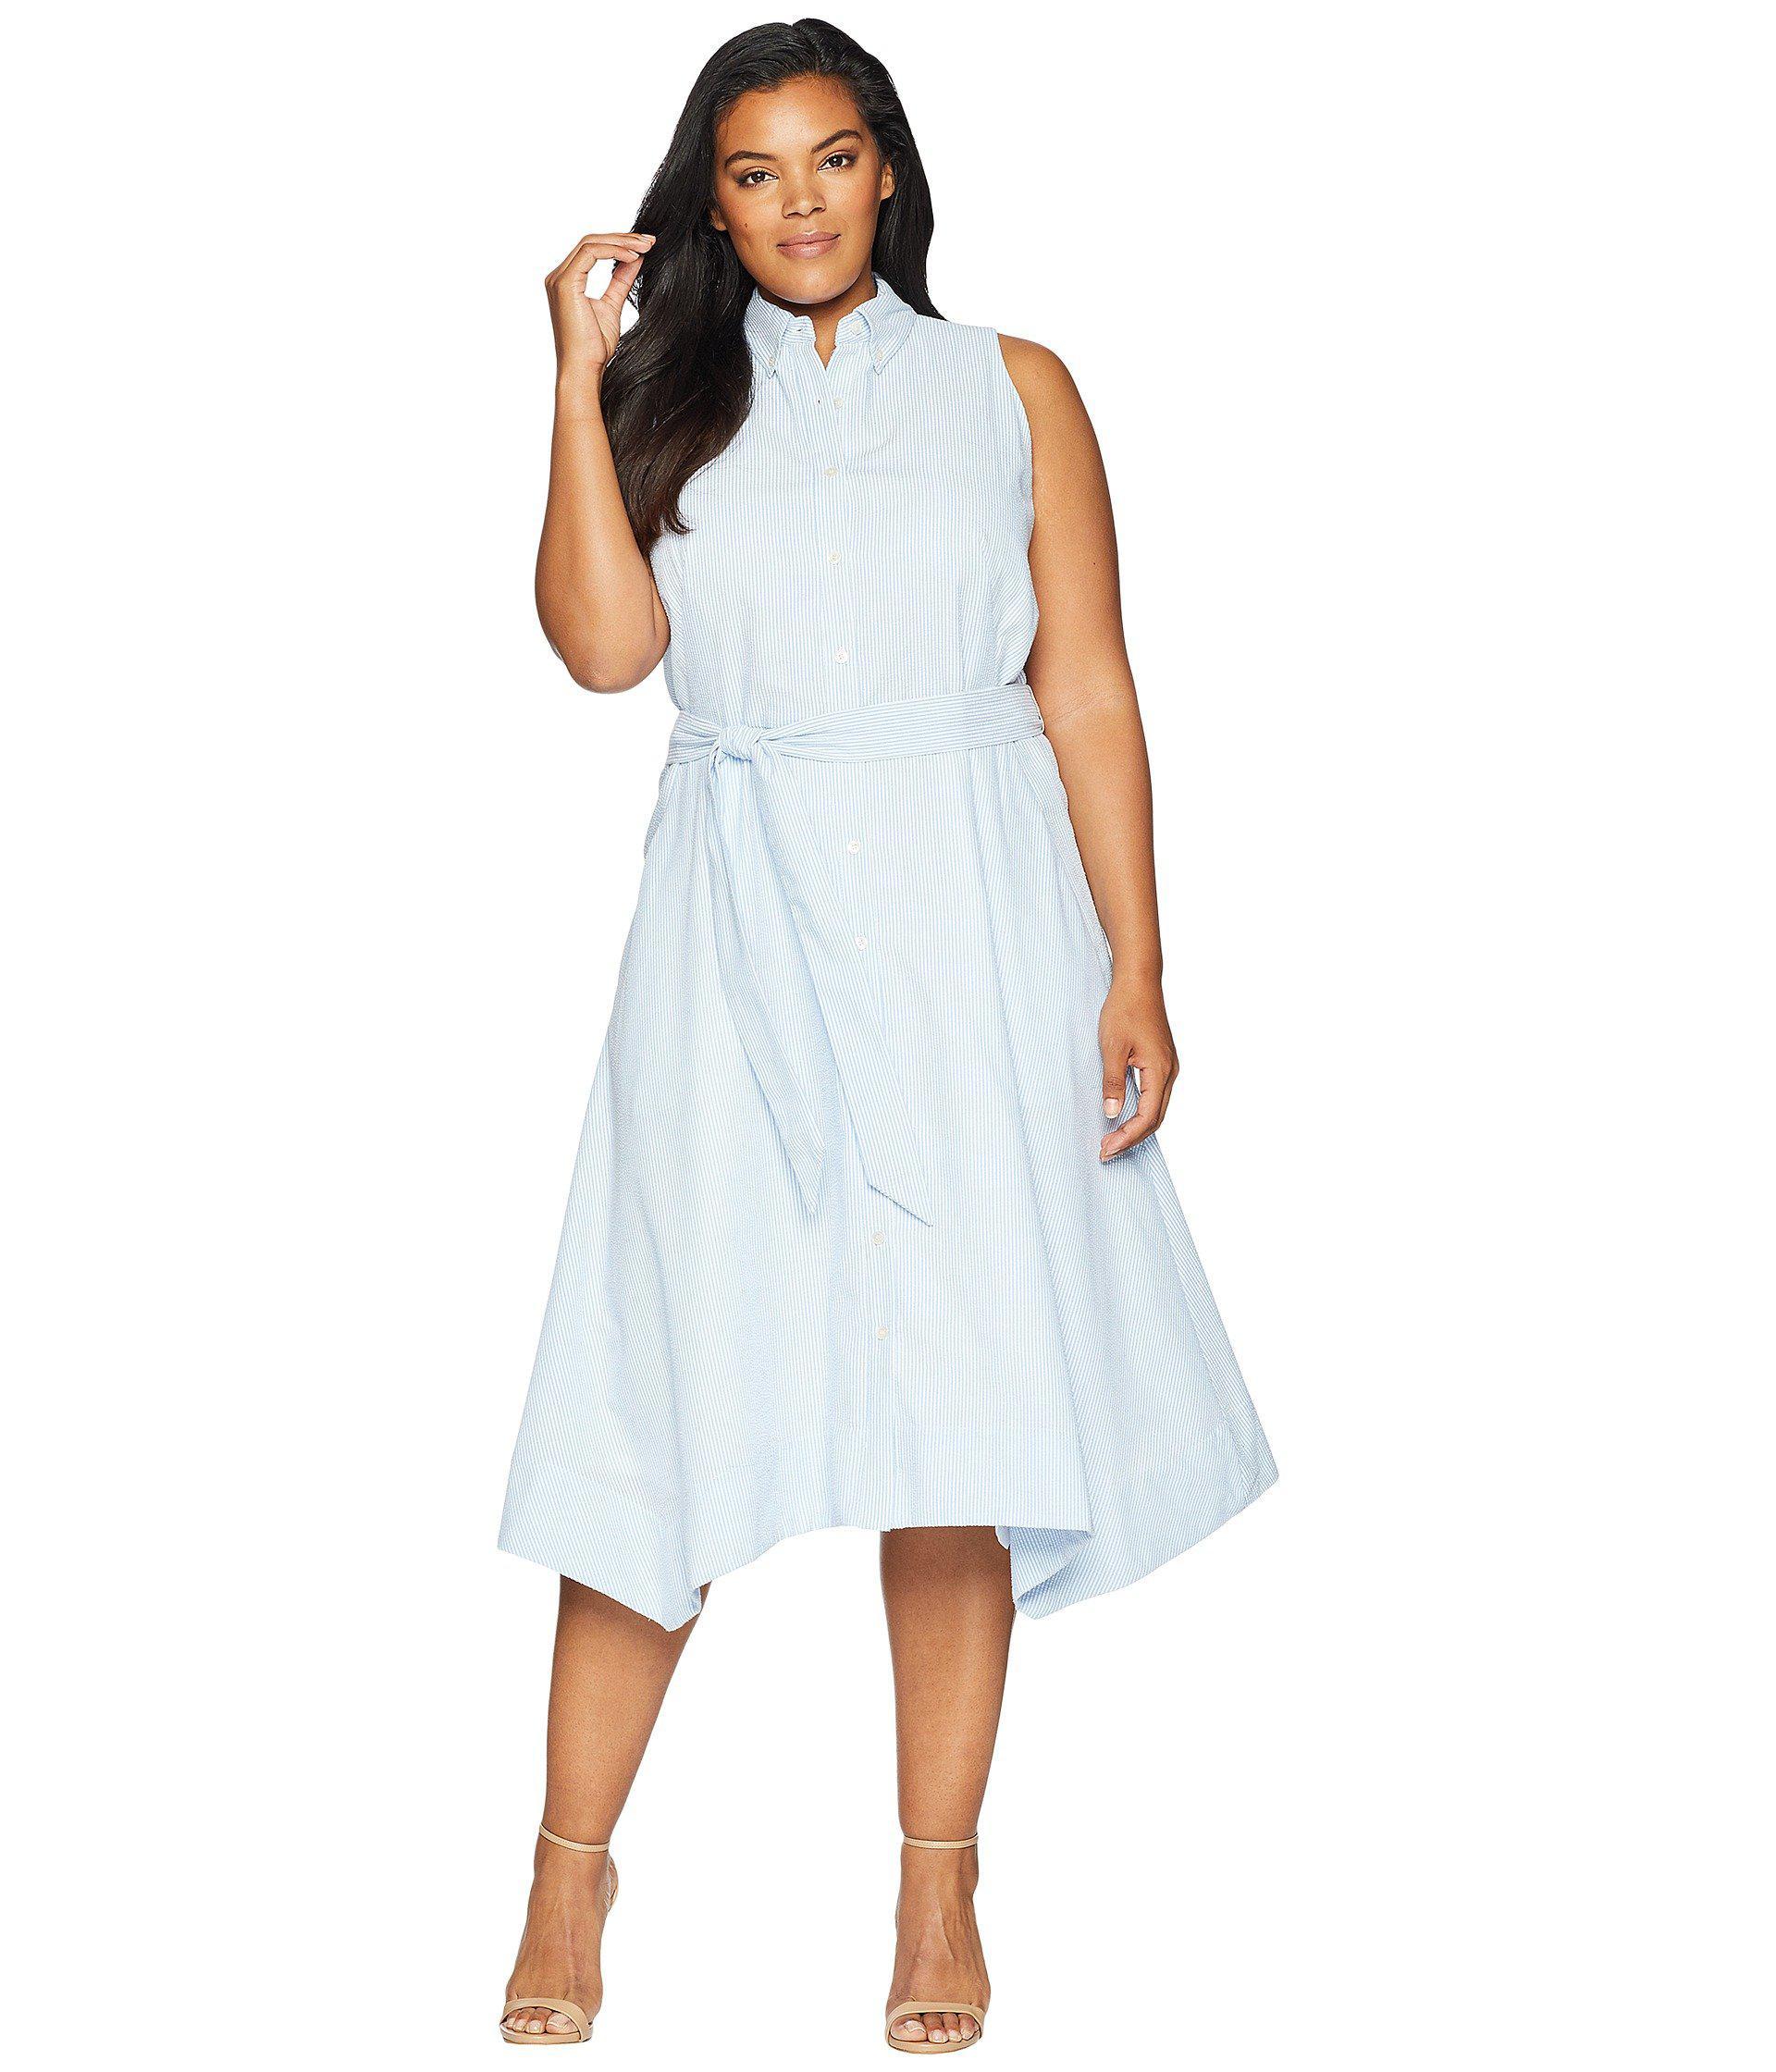 Tahari Plus Size Seersucker Shirtdress (blue/white) Women\'s Dress in ...